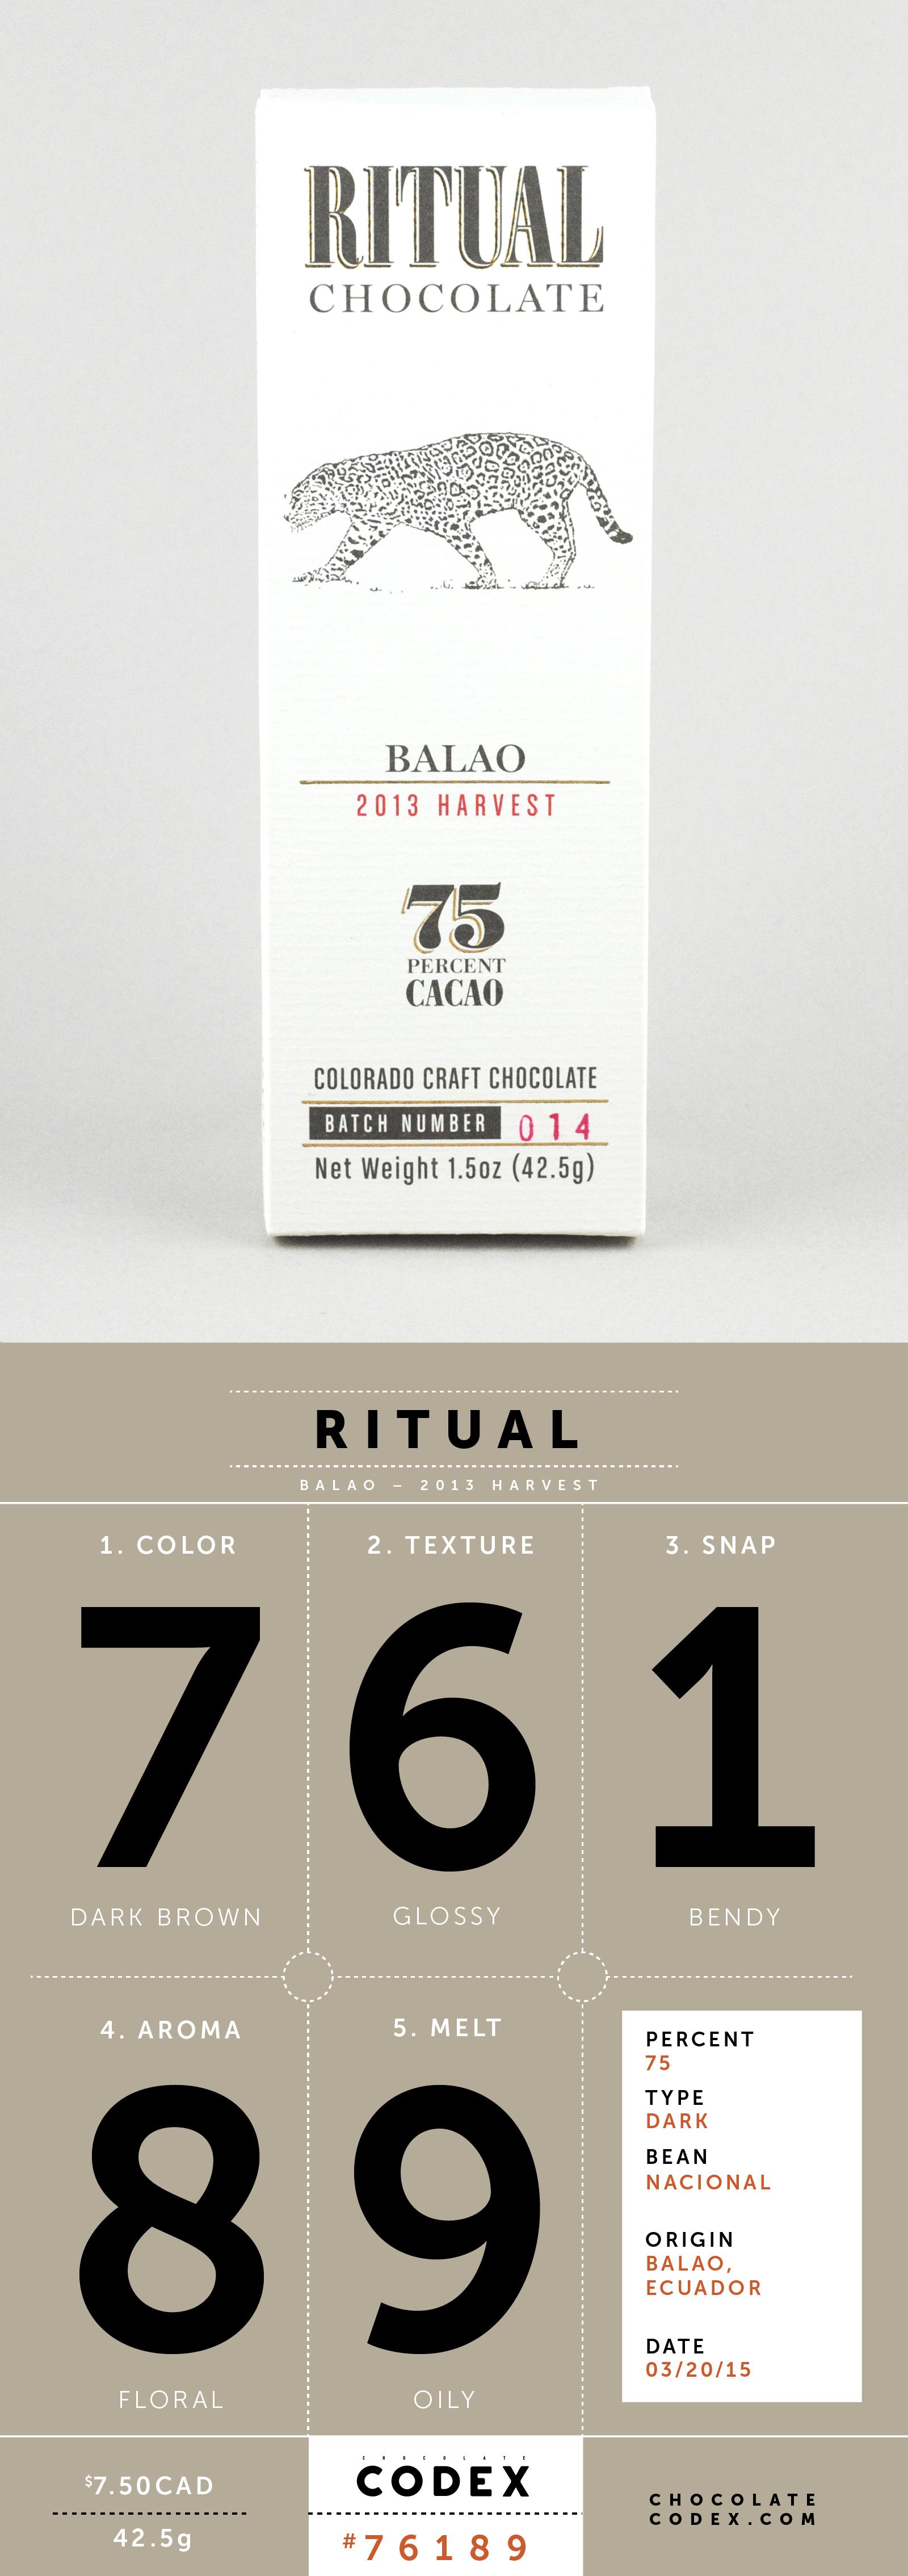 Chocolate-Codex-Reviews-Ritual-Balao-Ecuador-75